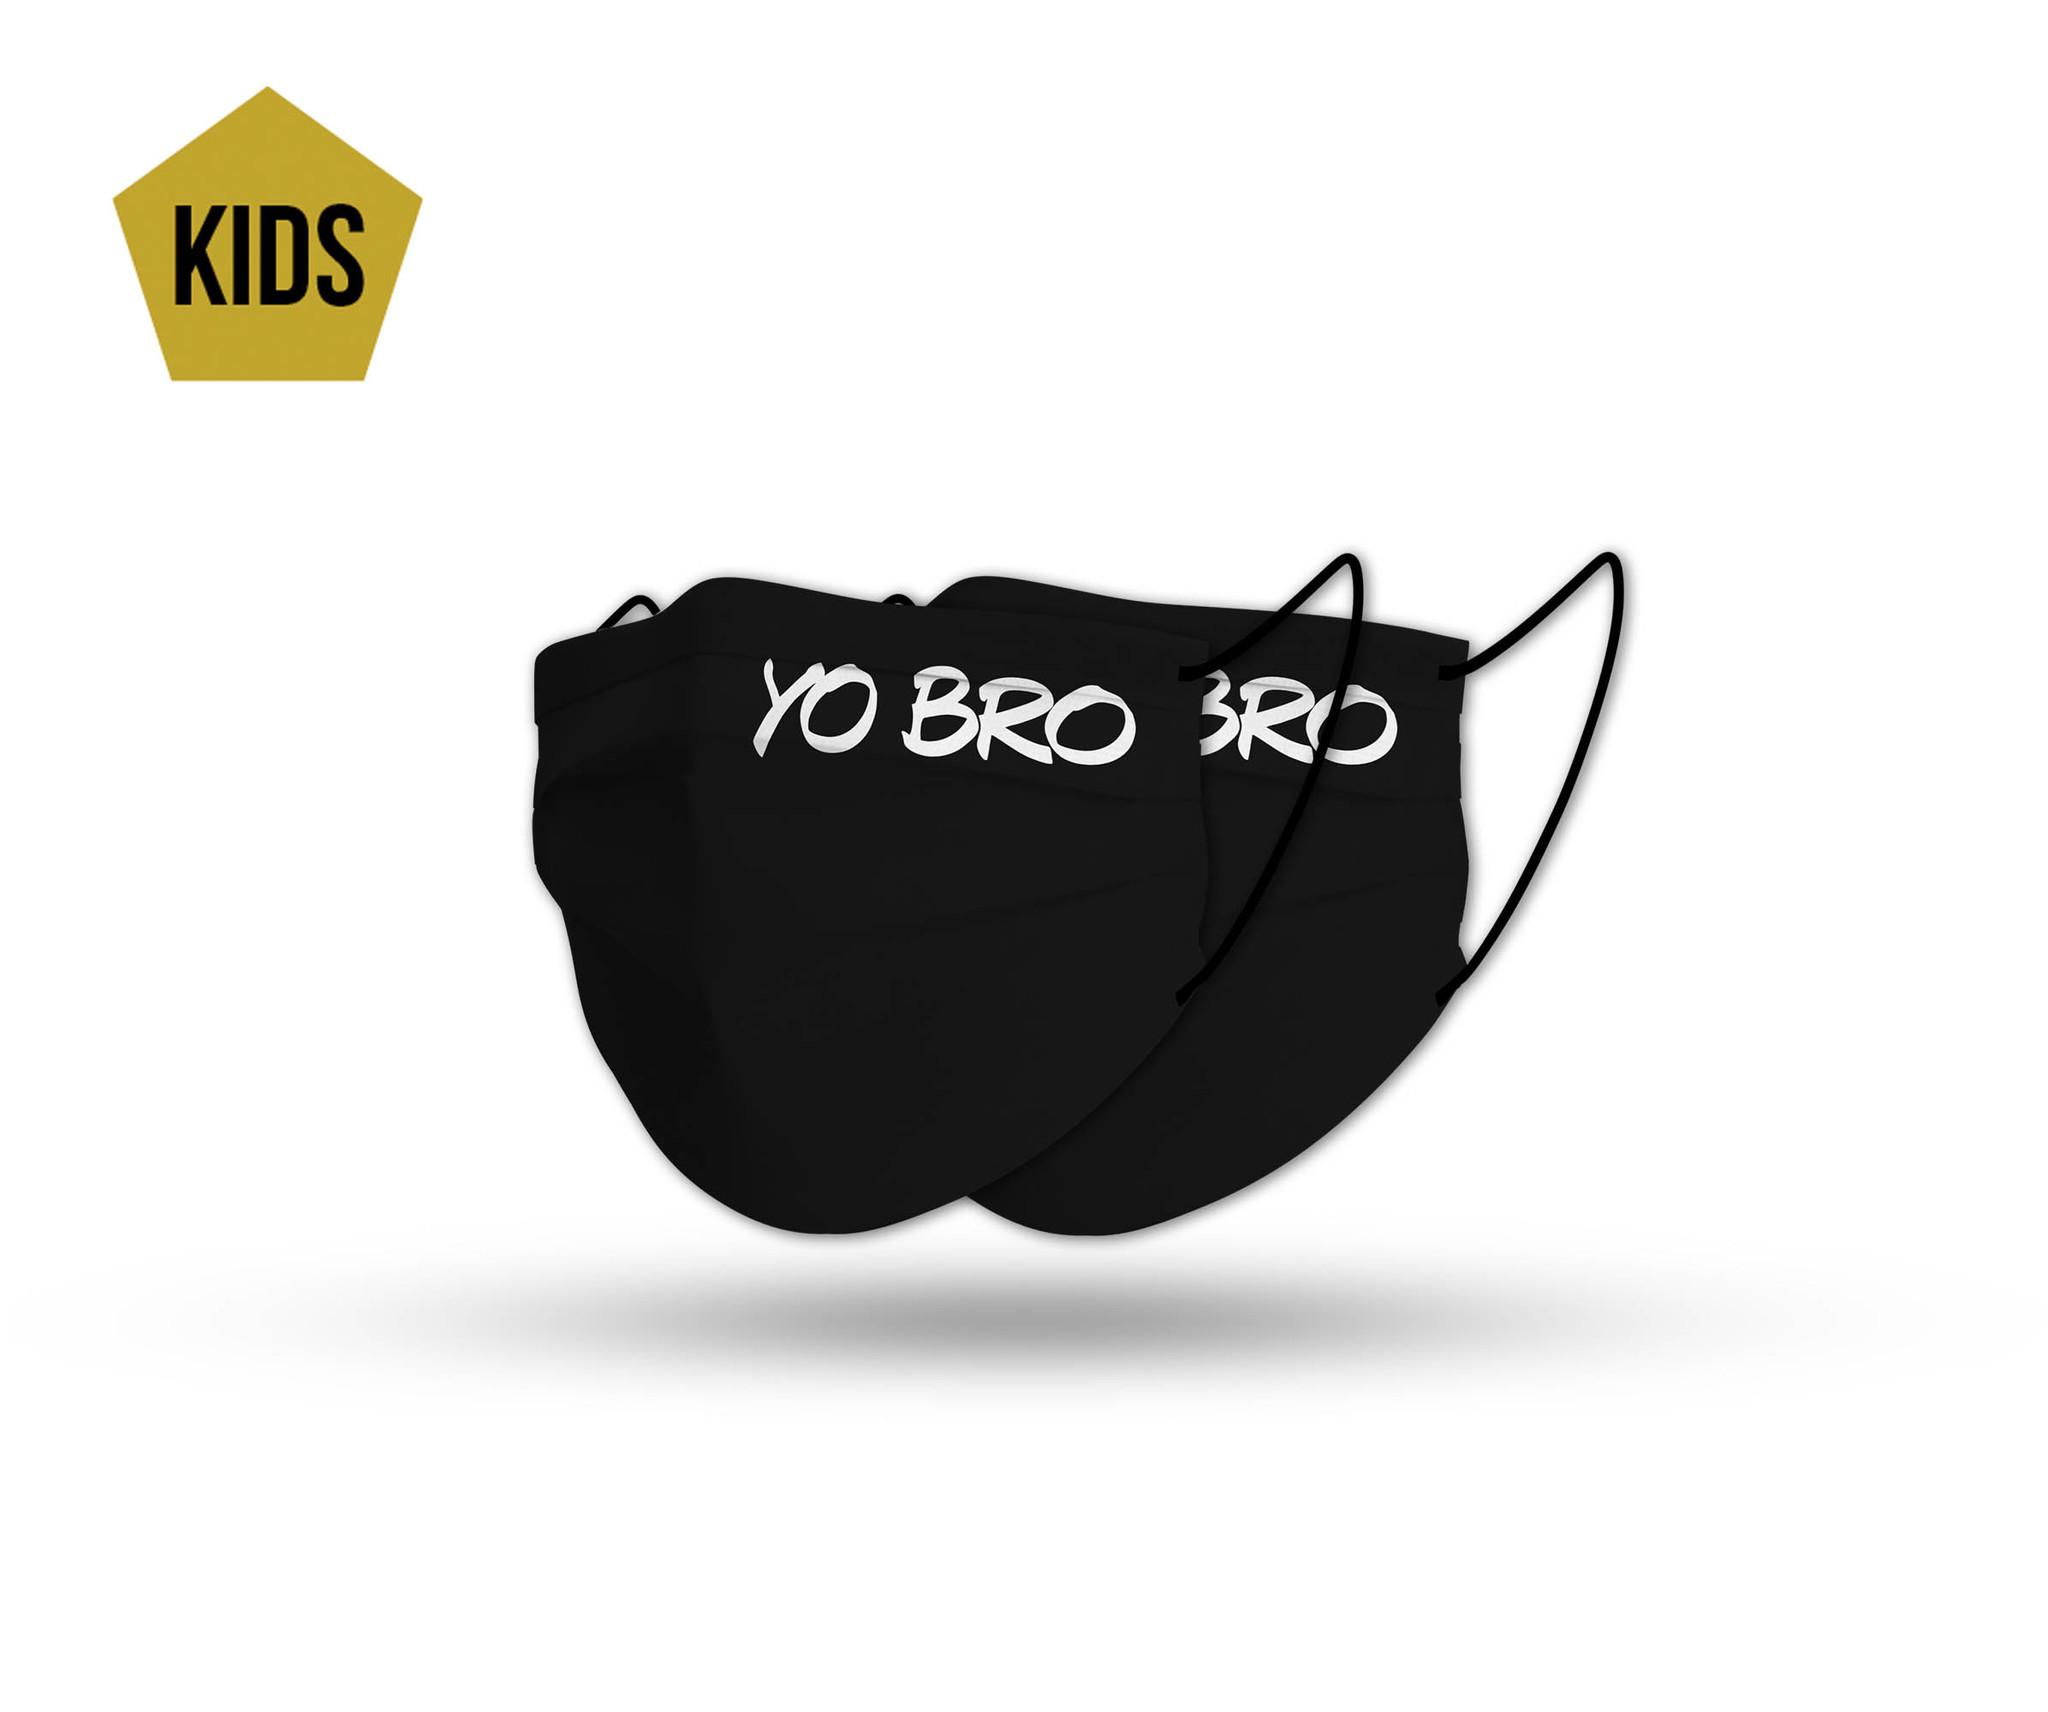 Topfanz Mondmasker kids bro set (2x)